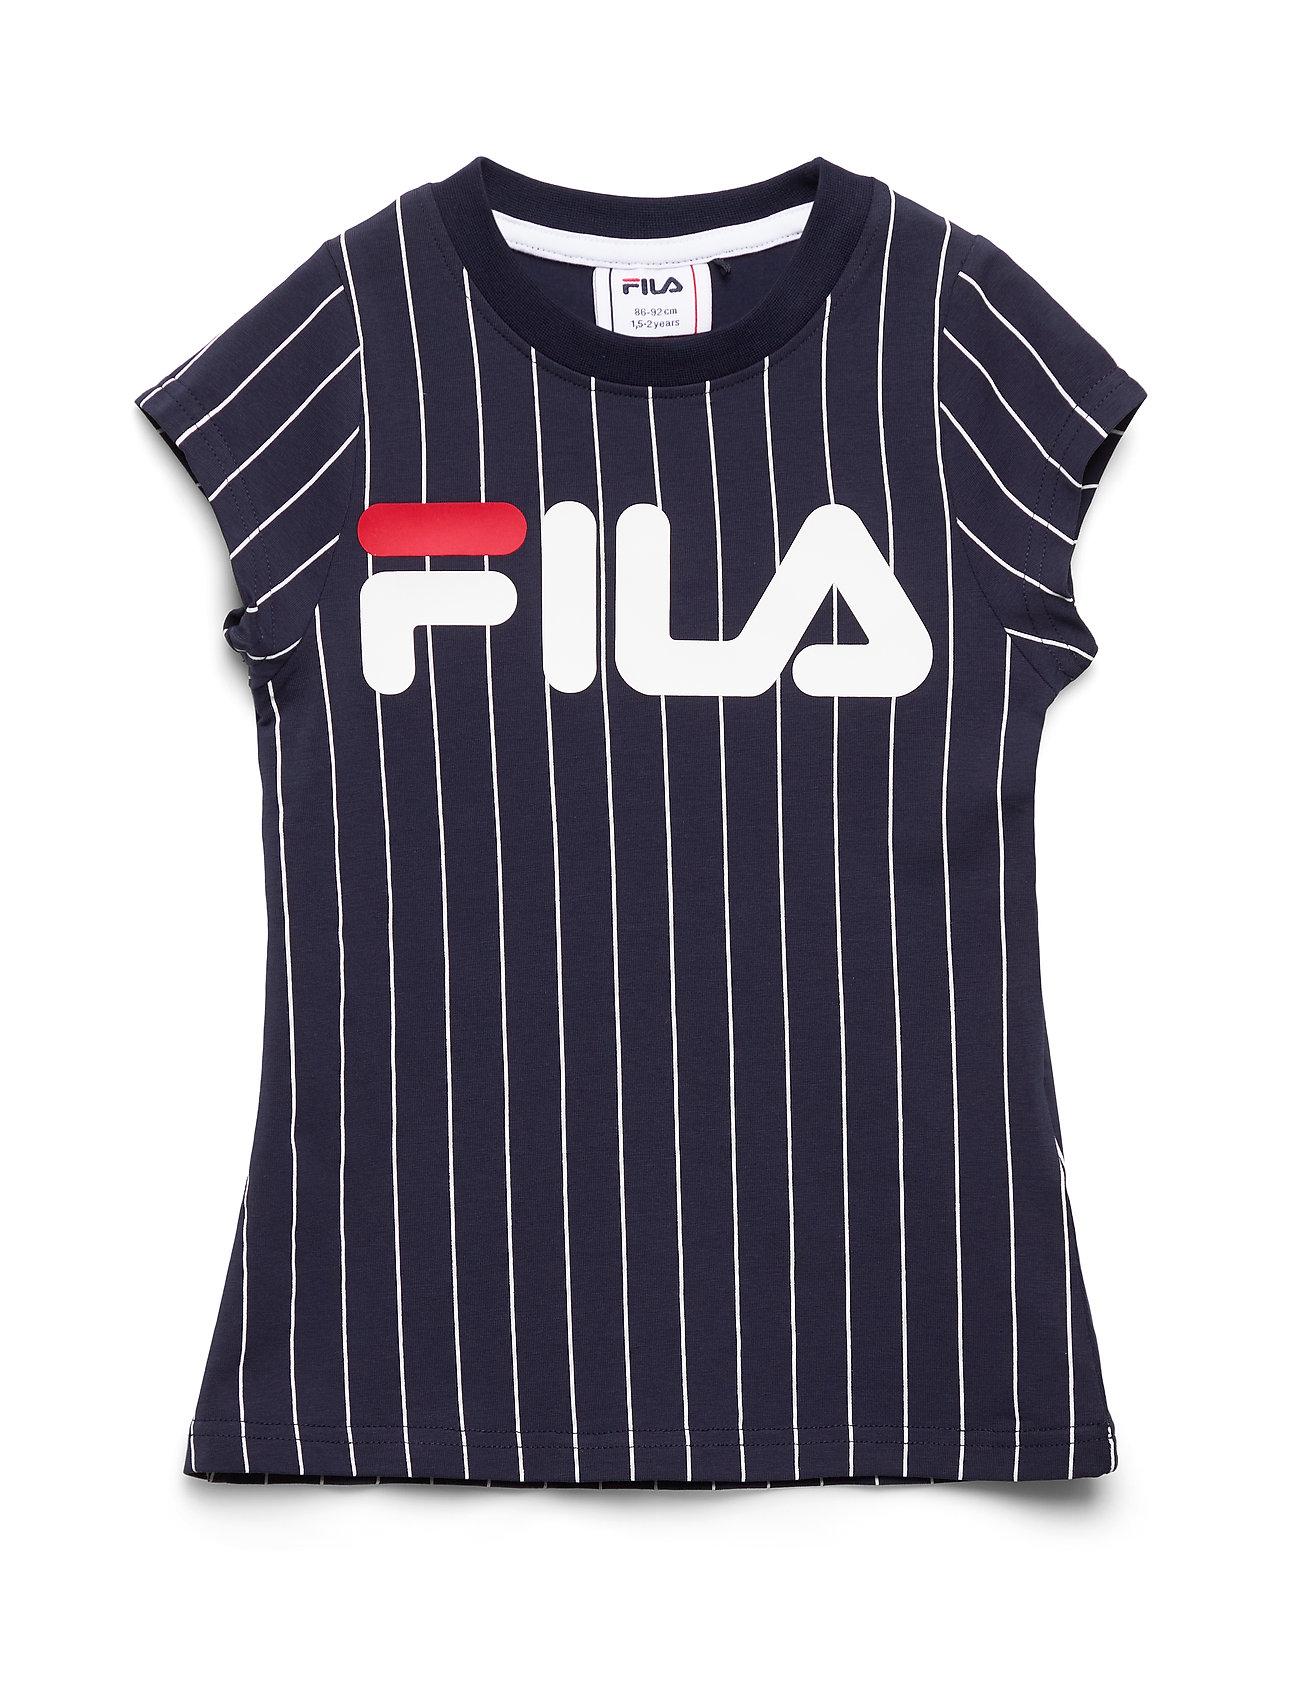 Image of Kids Tia Aop Tee Dress T-shirt Blå FILA (3406320815)